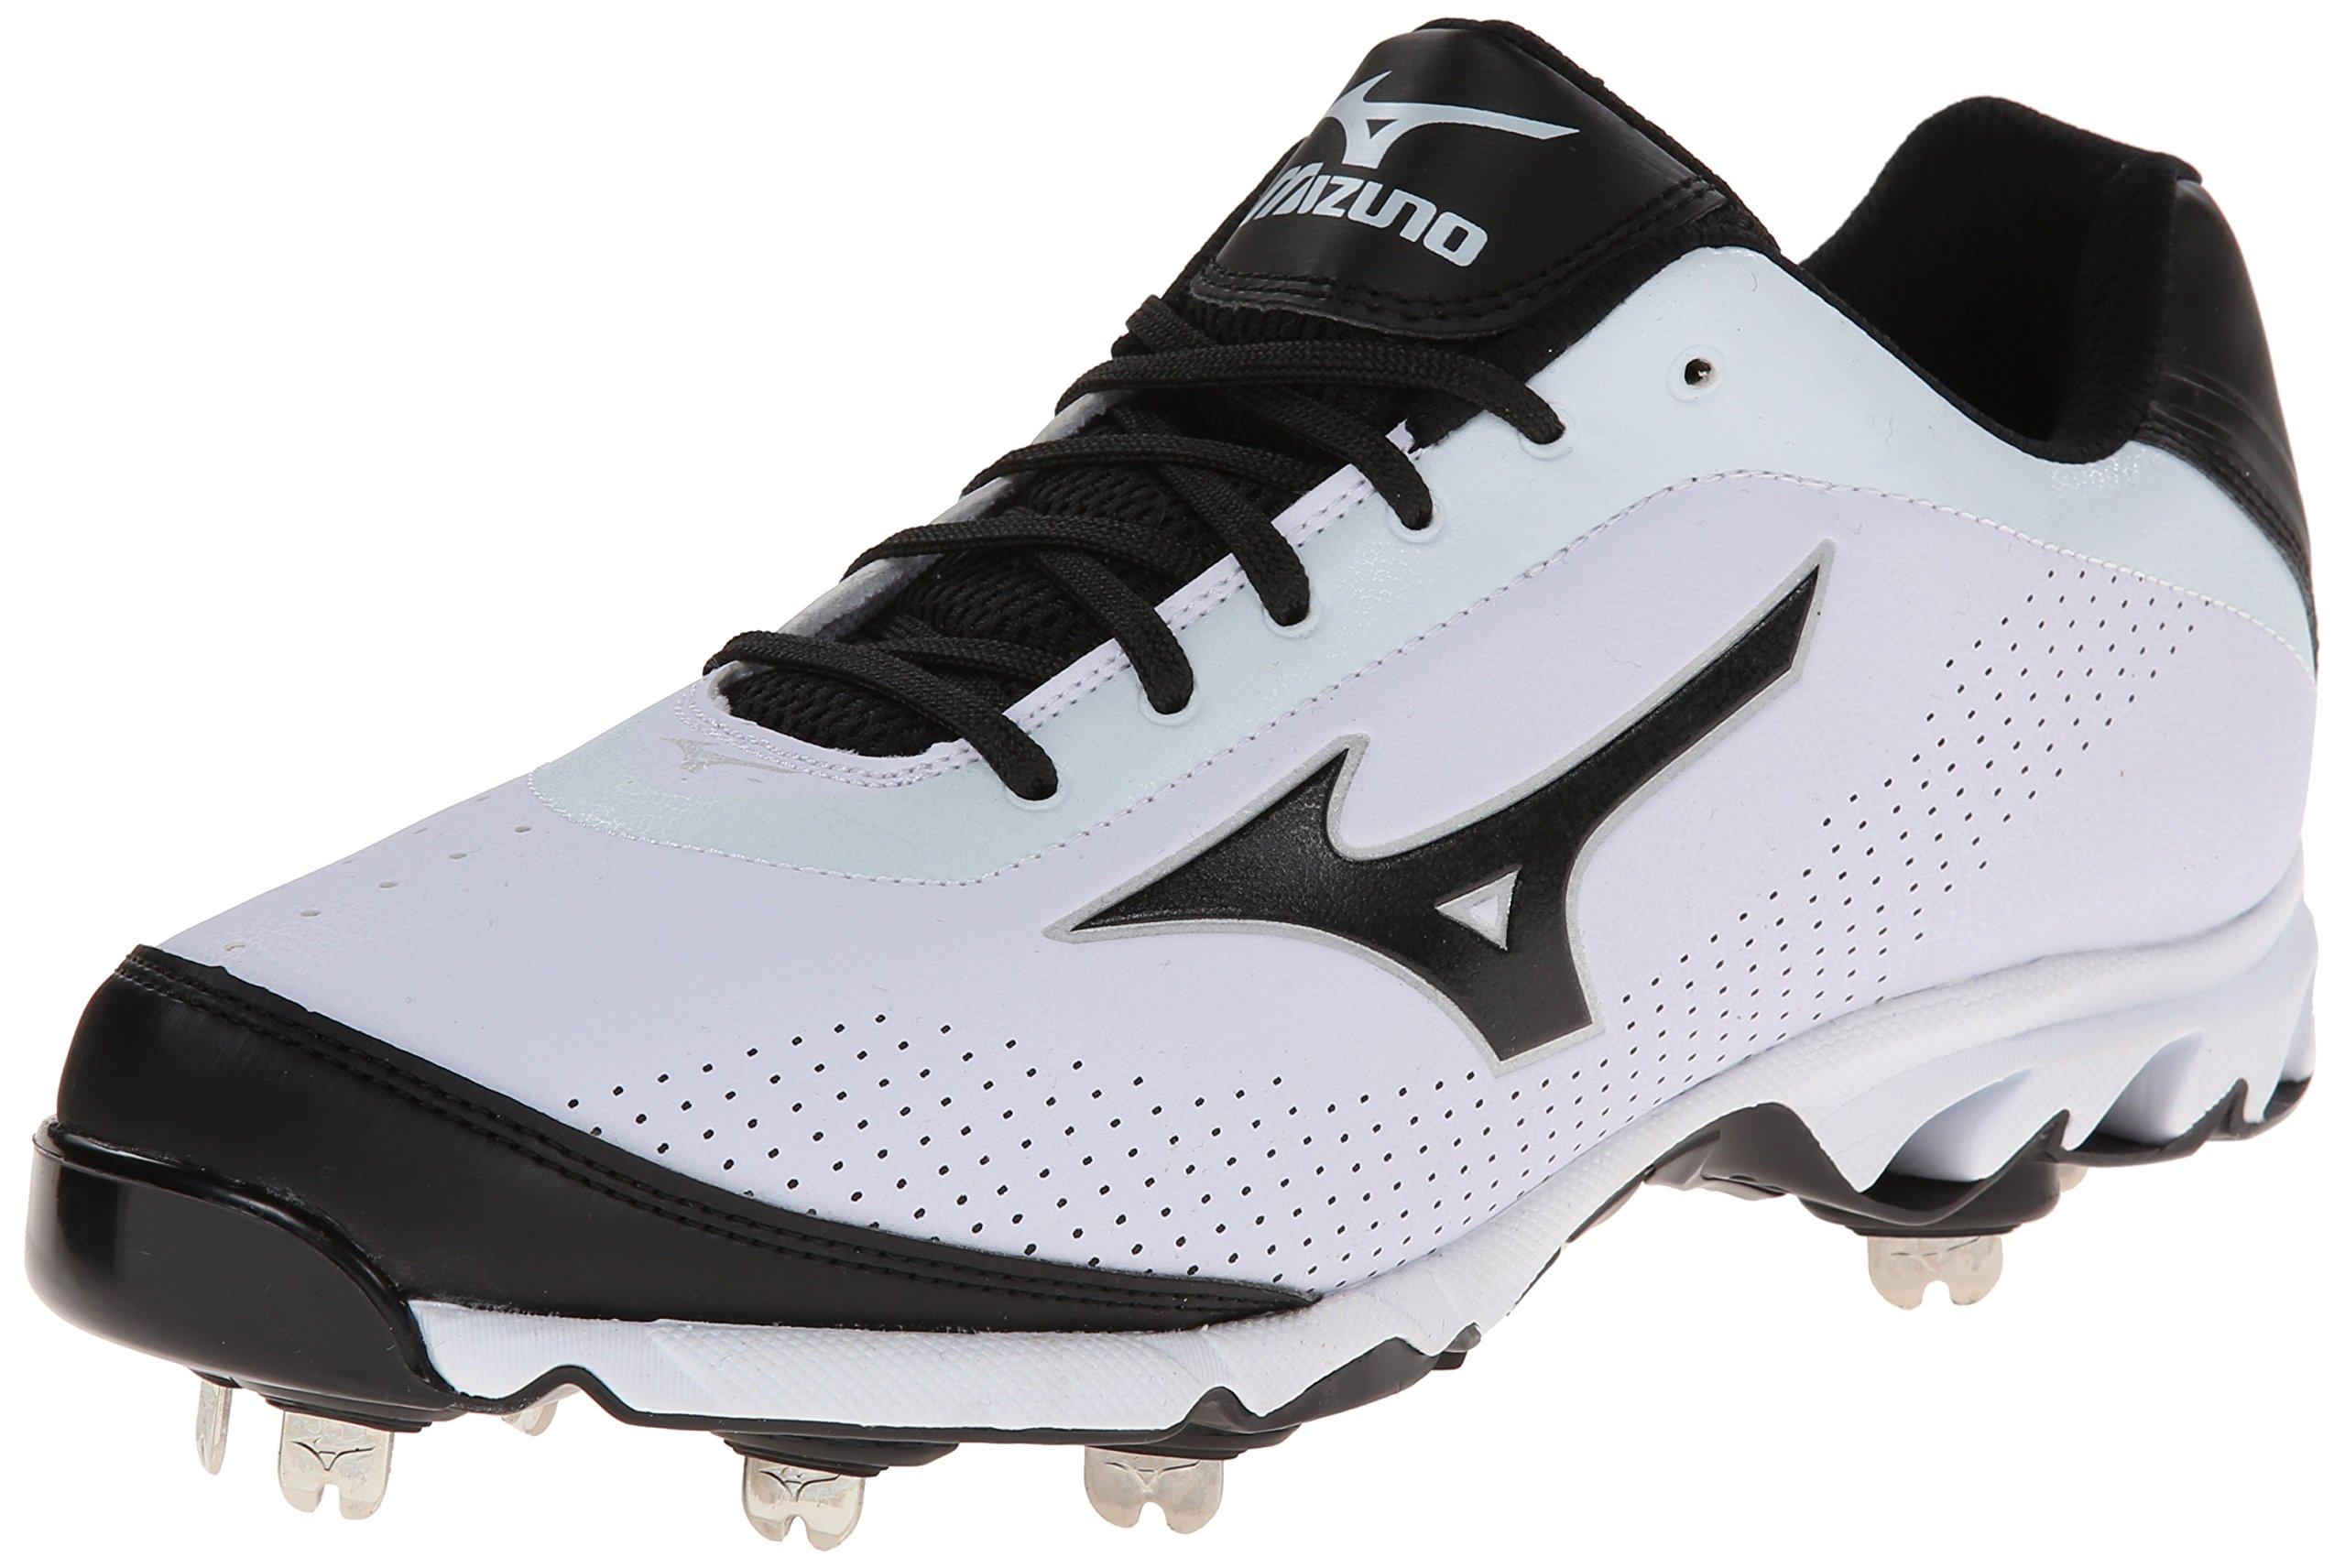 Mizuno Men's Vapor Elite 7 Low Baseball Cleat,White/Black,14 M US by Mizuno